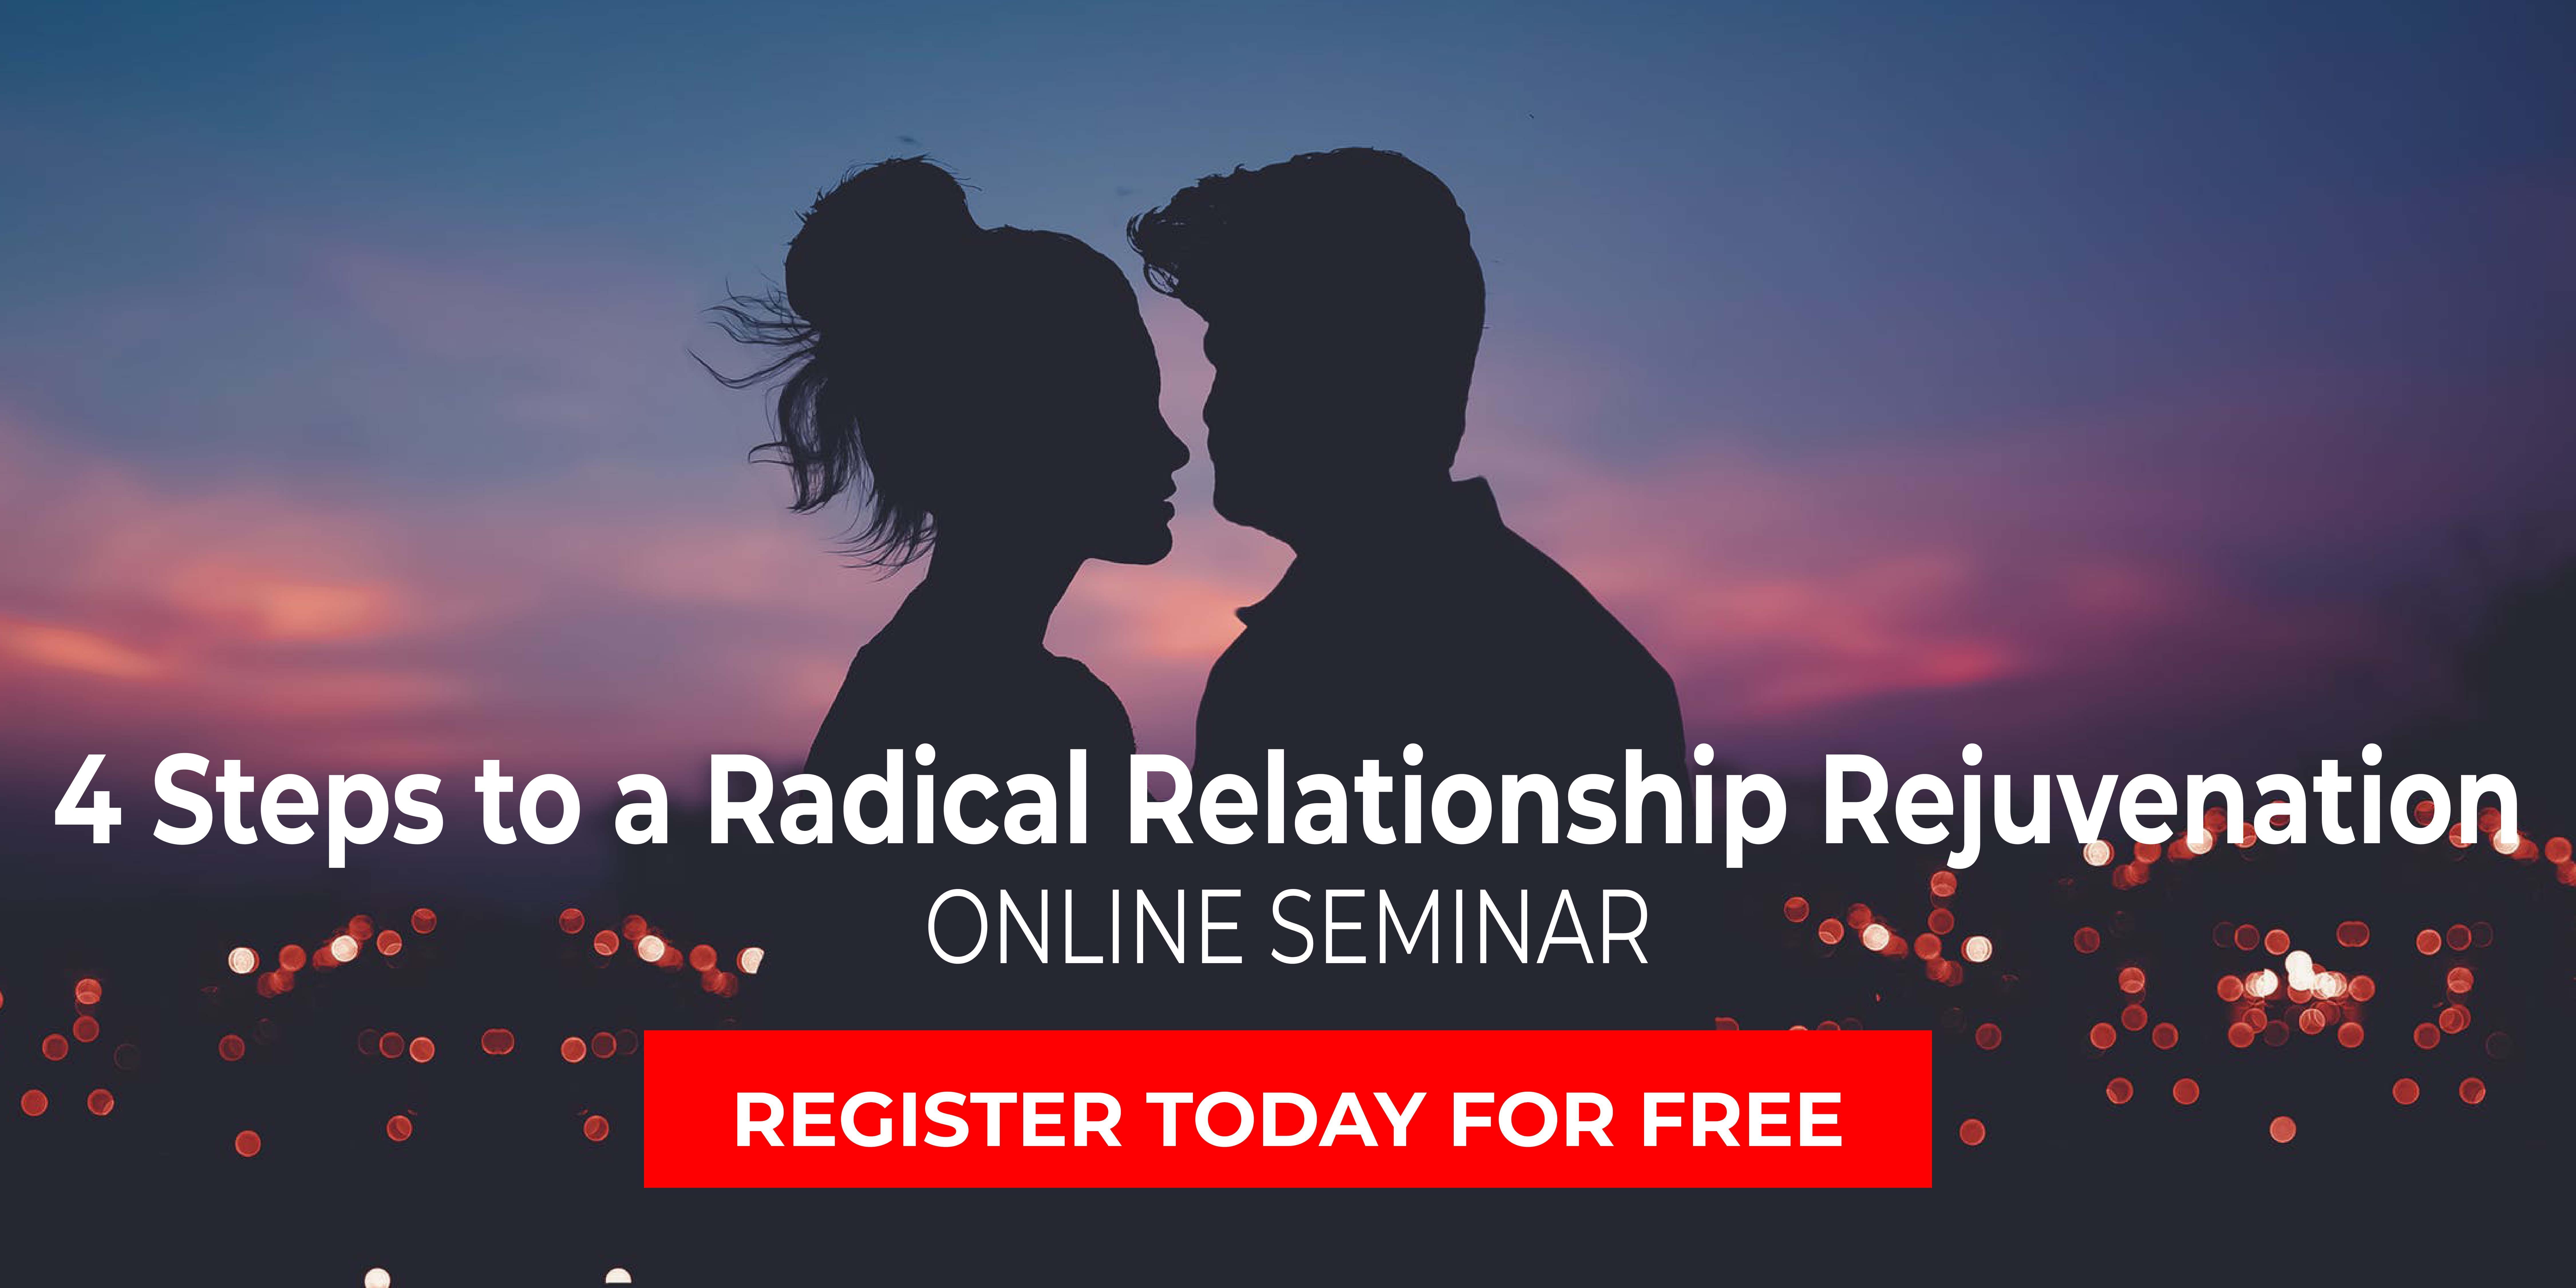 The 4 Steps to a Radical Relationship Rejuvenation-BE